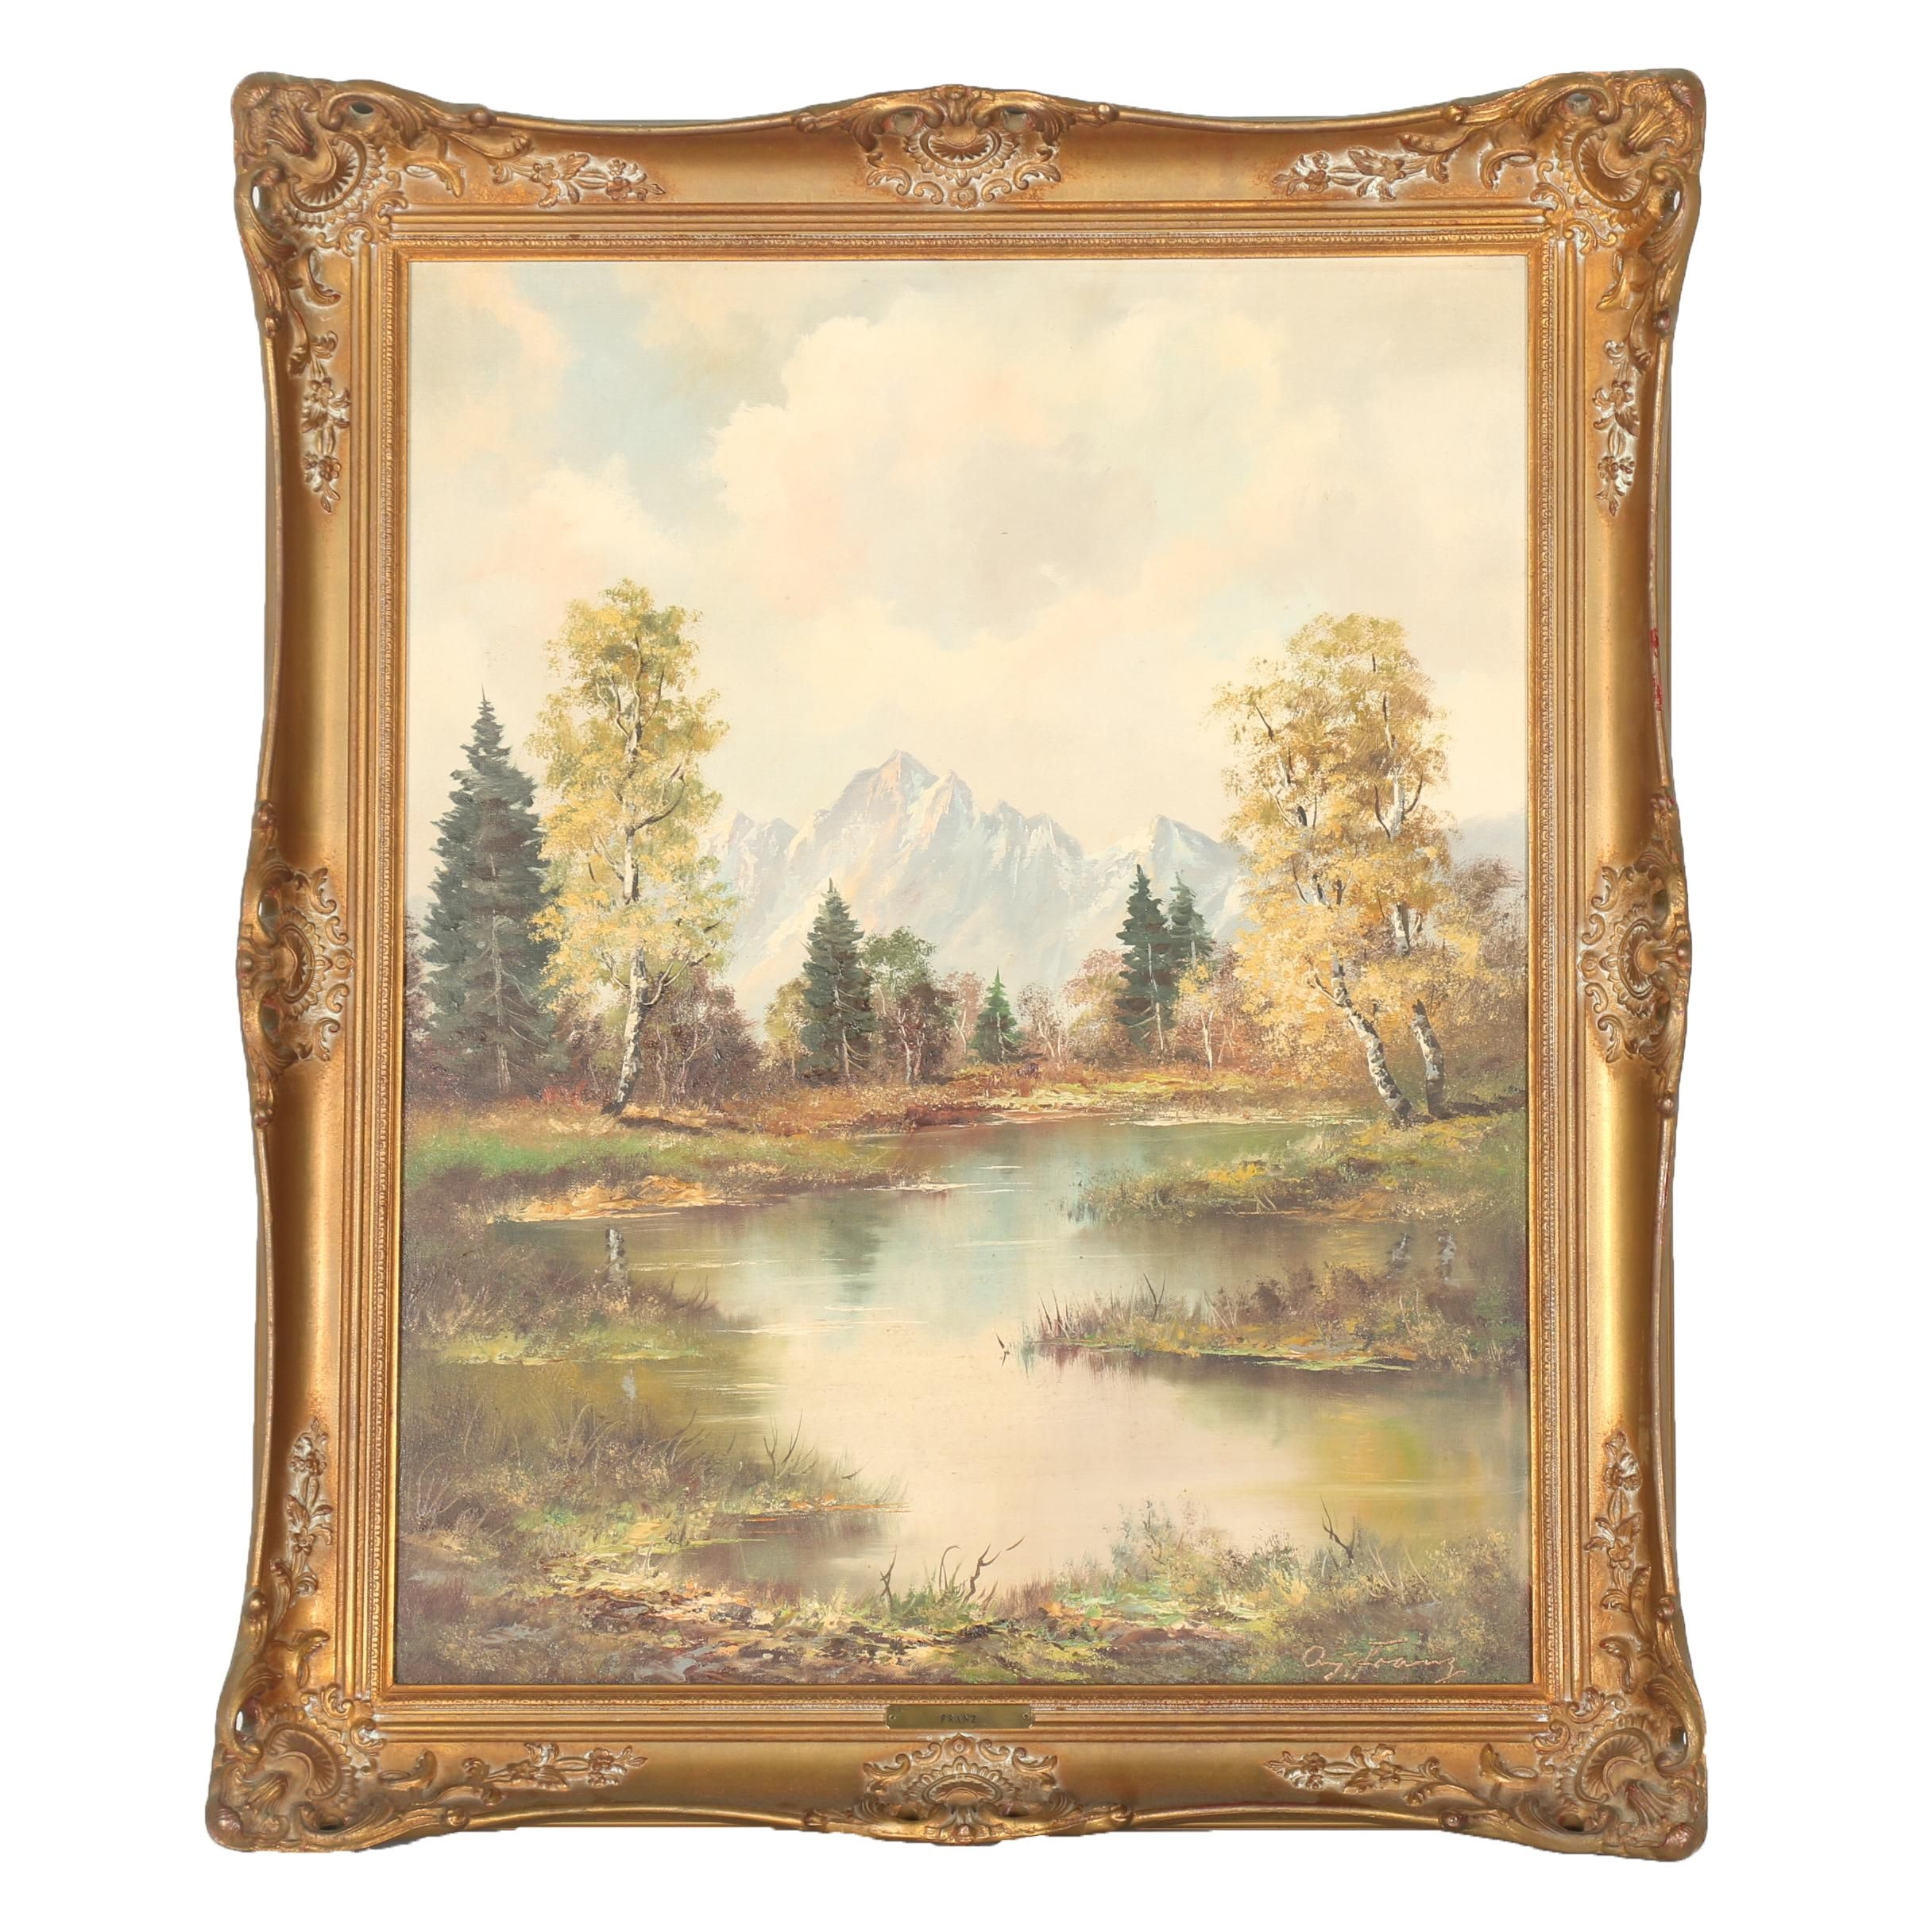 Philipp Franz Landscape Oil on Canvas